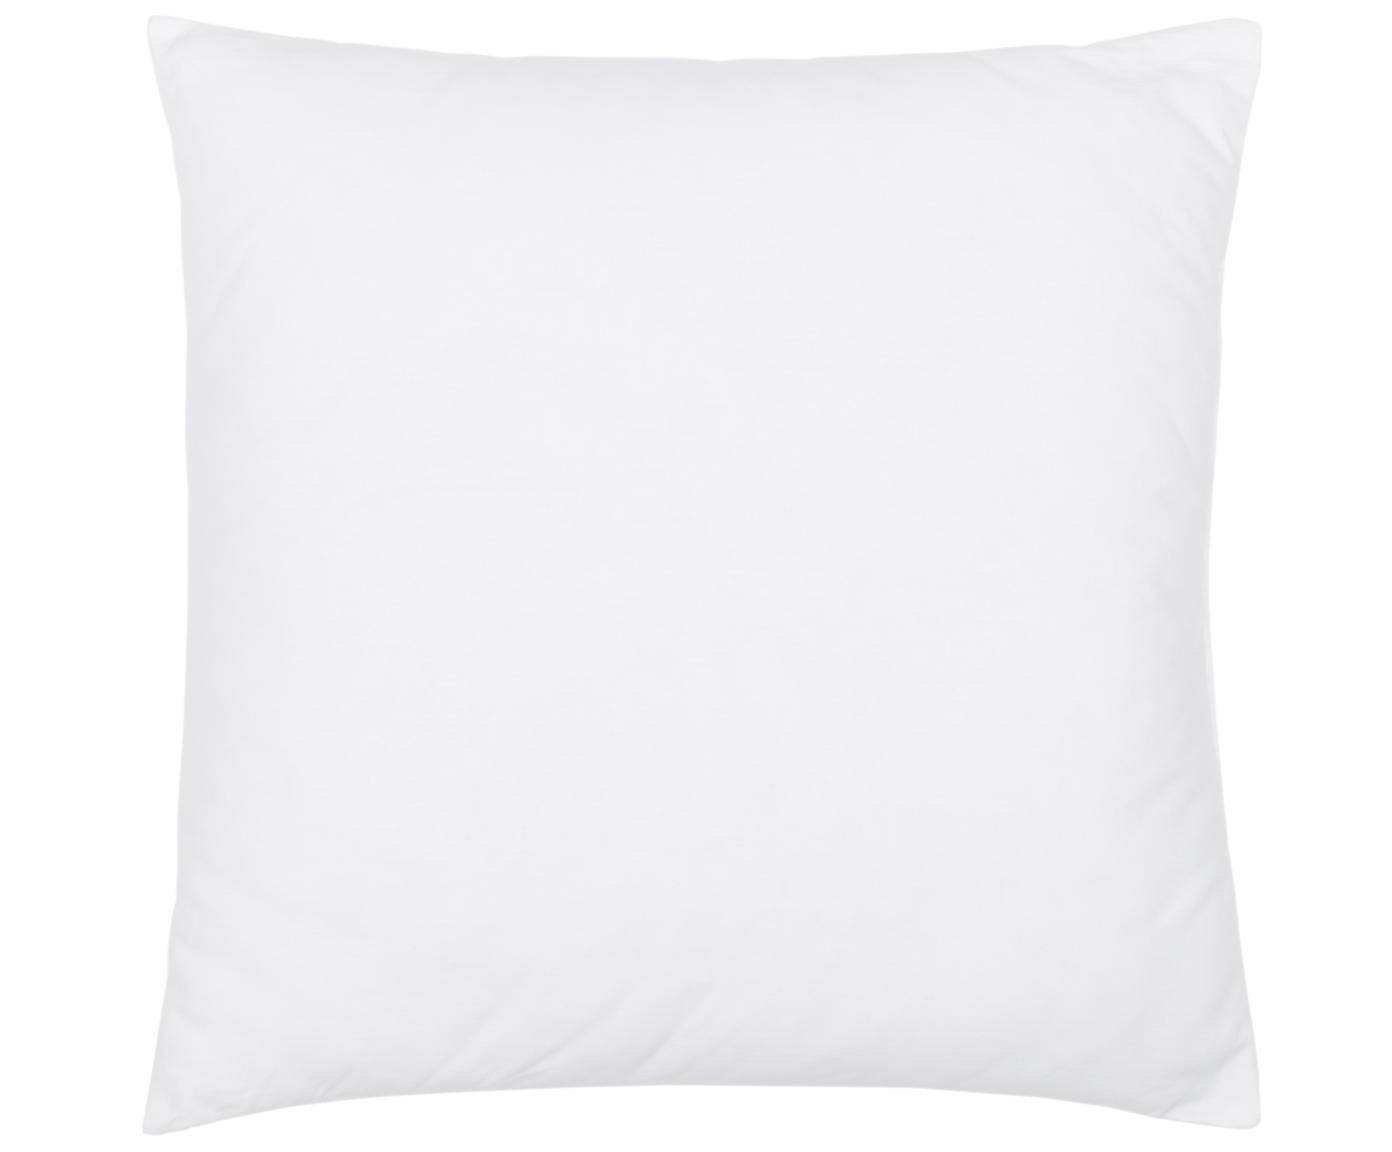 Relleno de cojín de microfibras Sia, 50x50, Funda: 100%algodón, Blanco, An 50 x L 50 cm